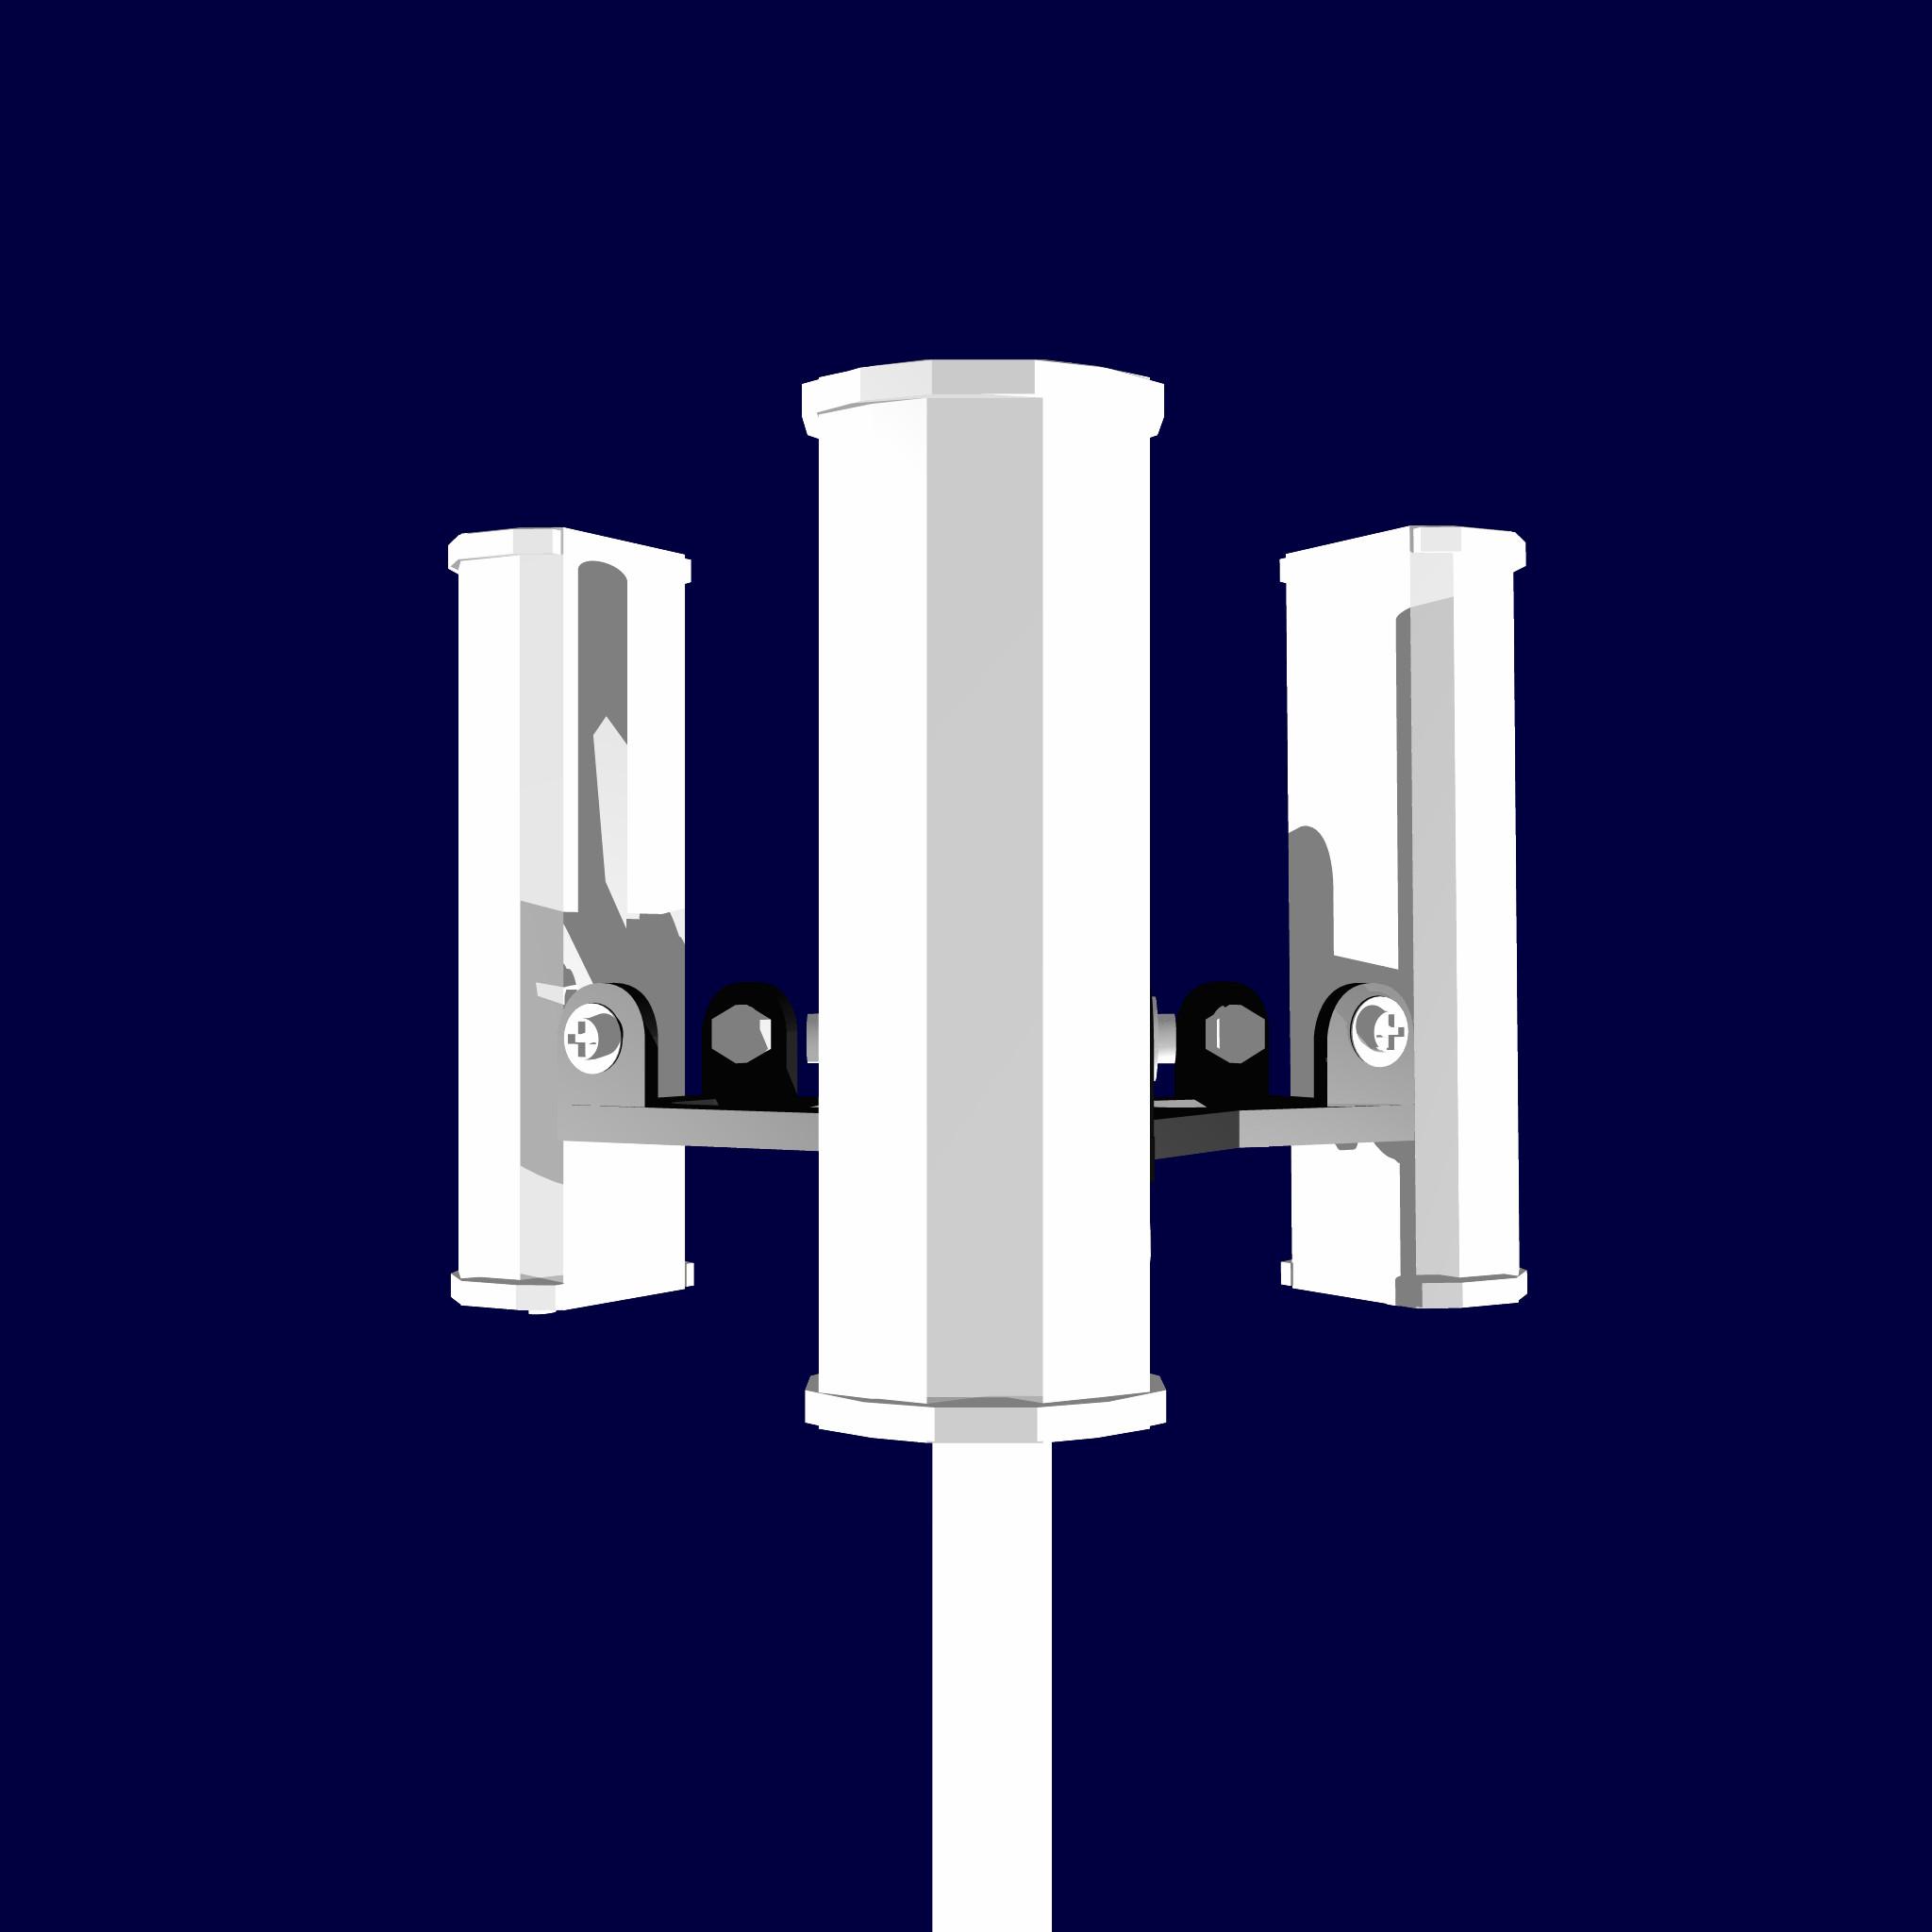 Sector_Antenna_28.jpg